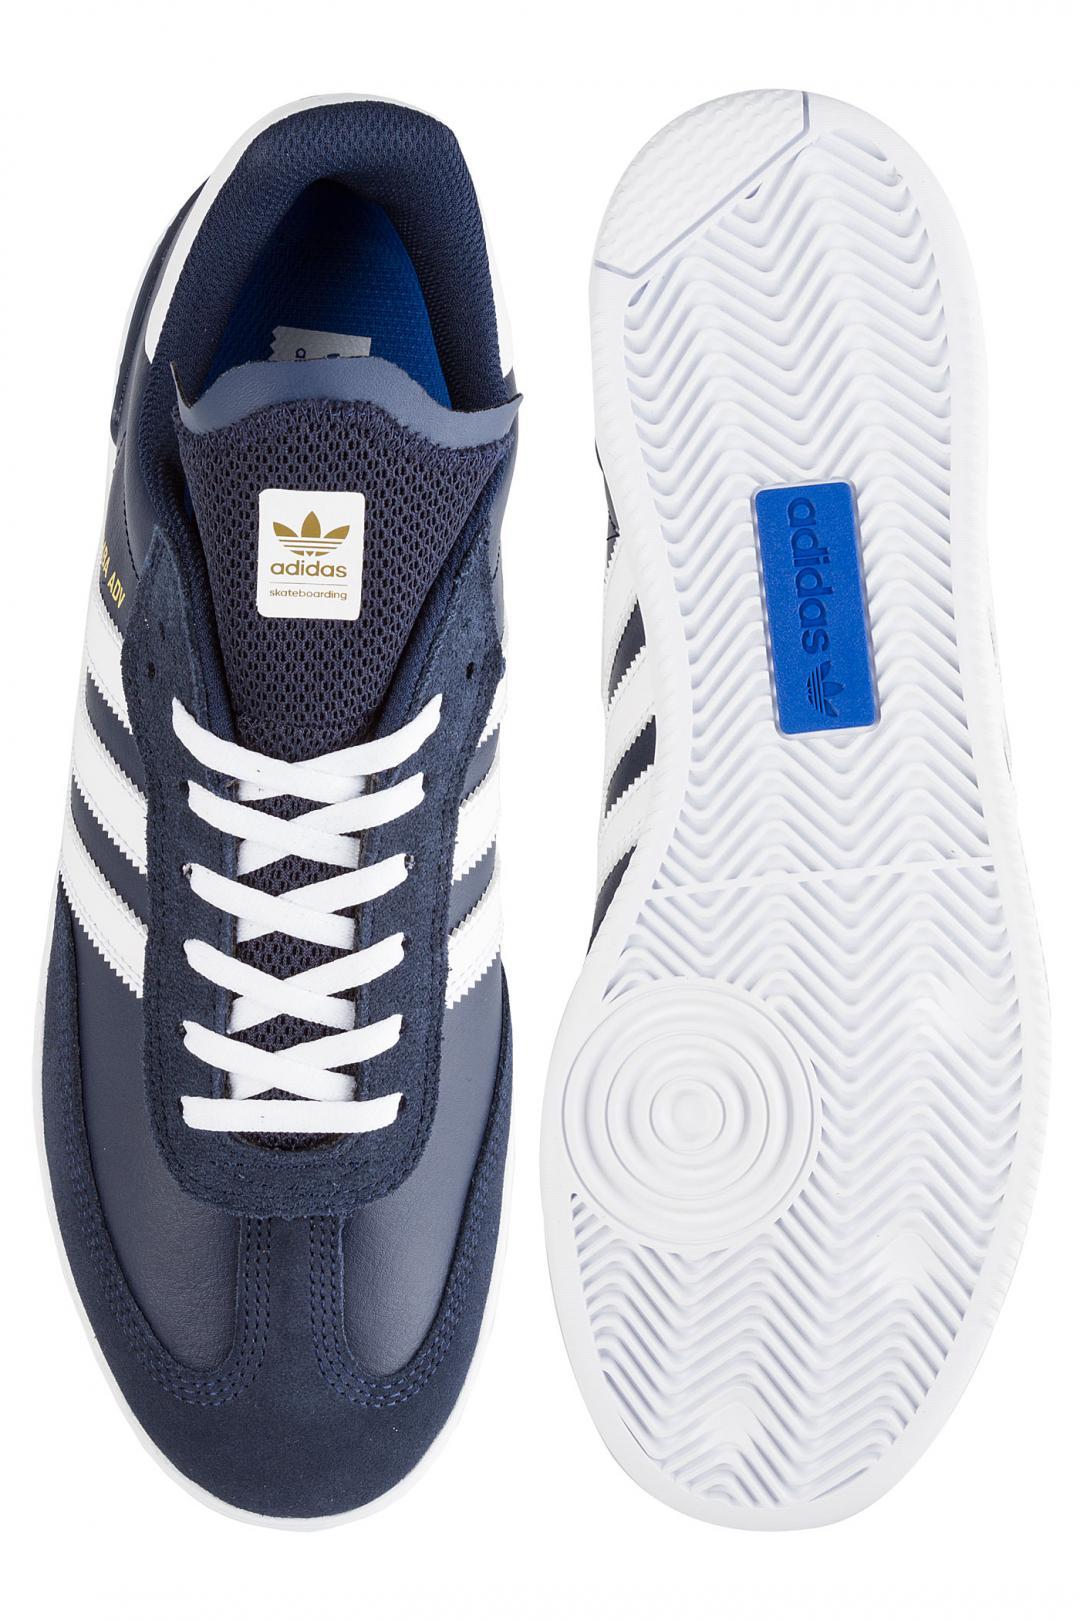 Uomo adidas Skateboarding Samba ADV collegiate navy white | Sneakers low top